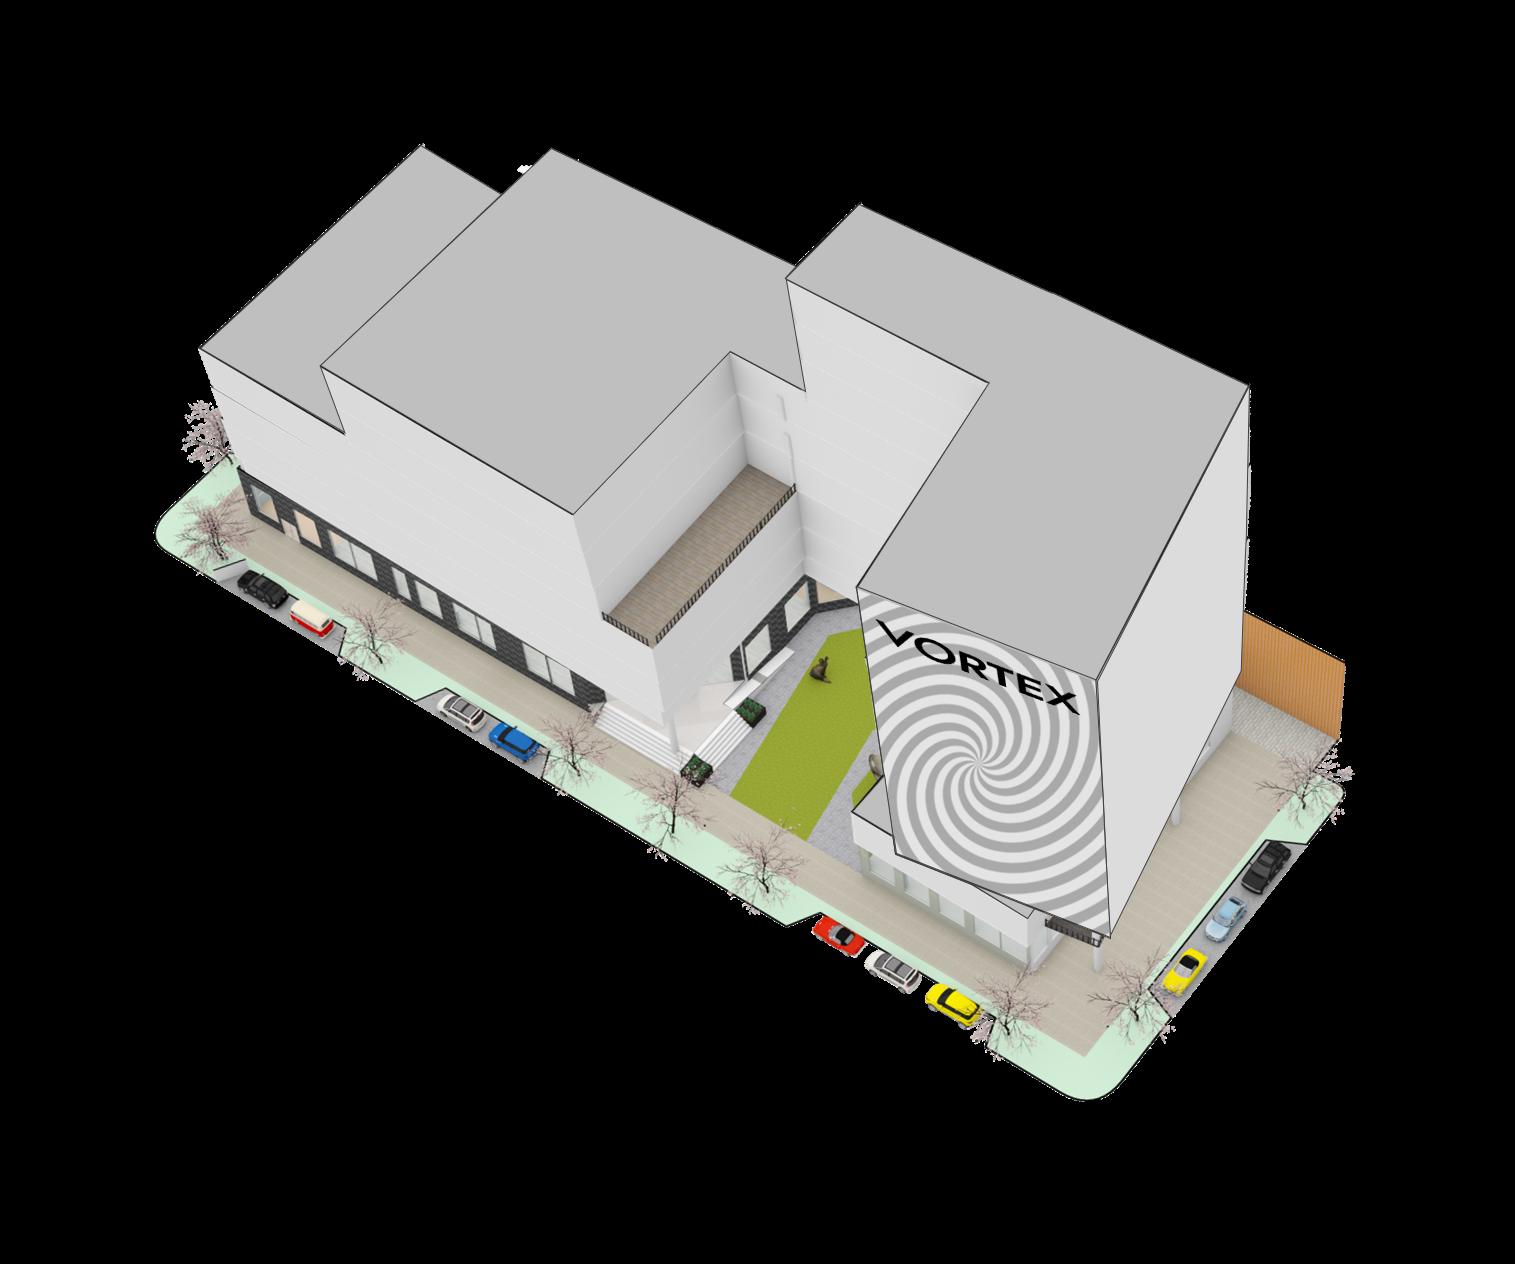 Vortex Full Building Mass.png